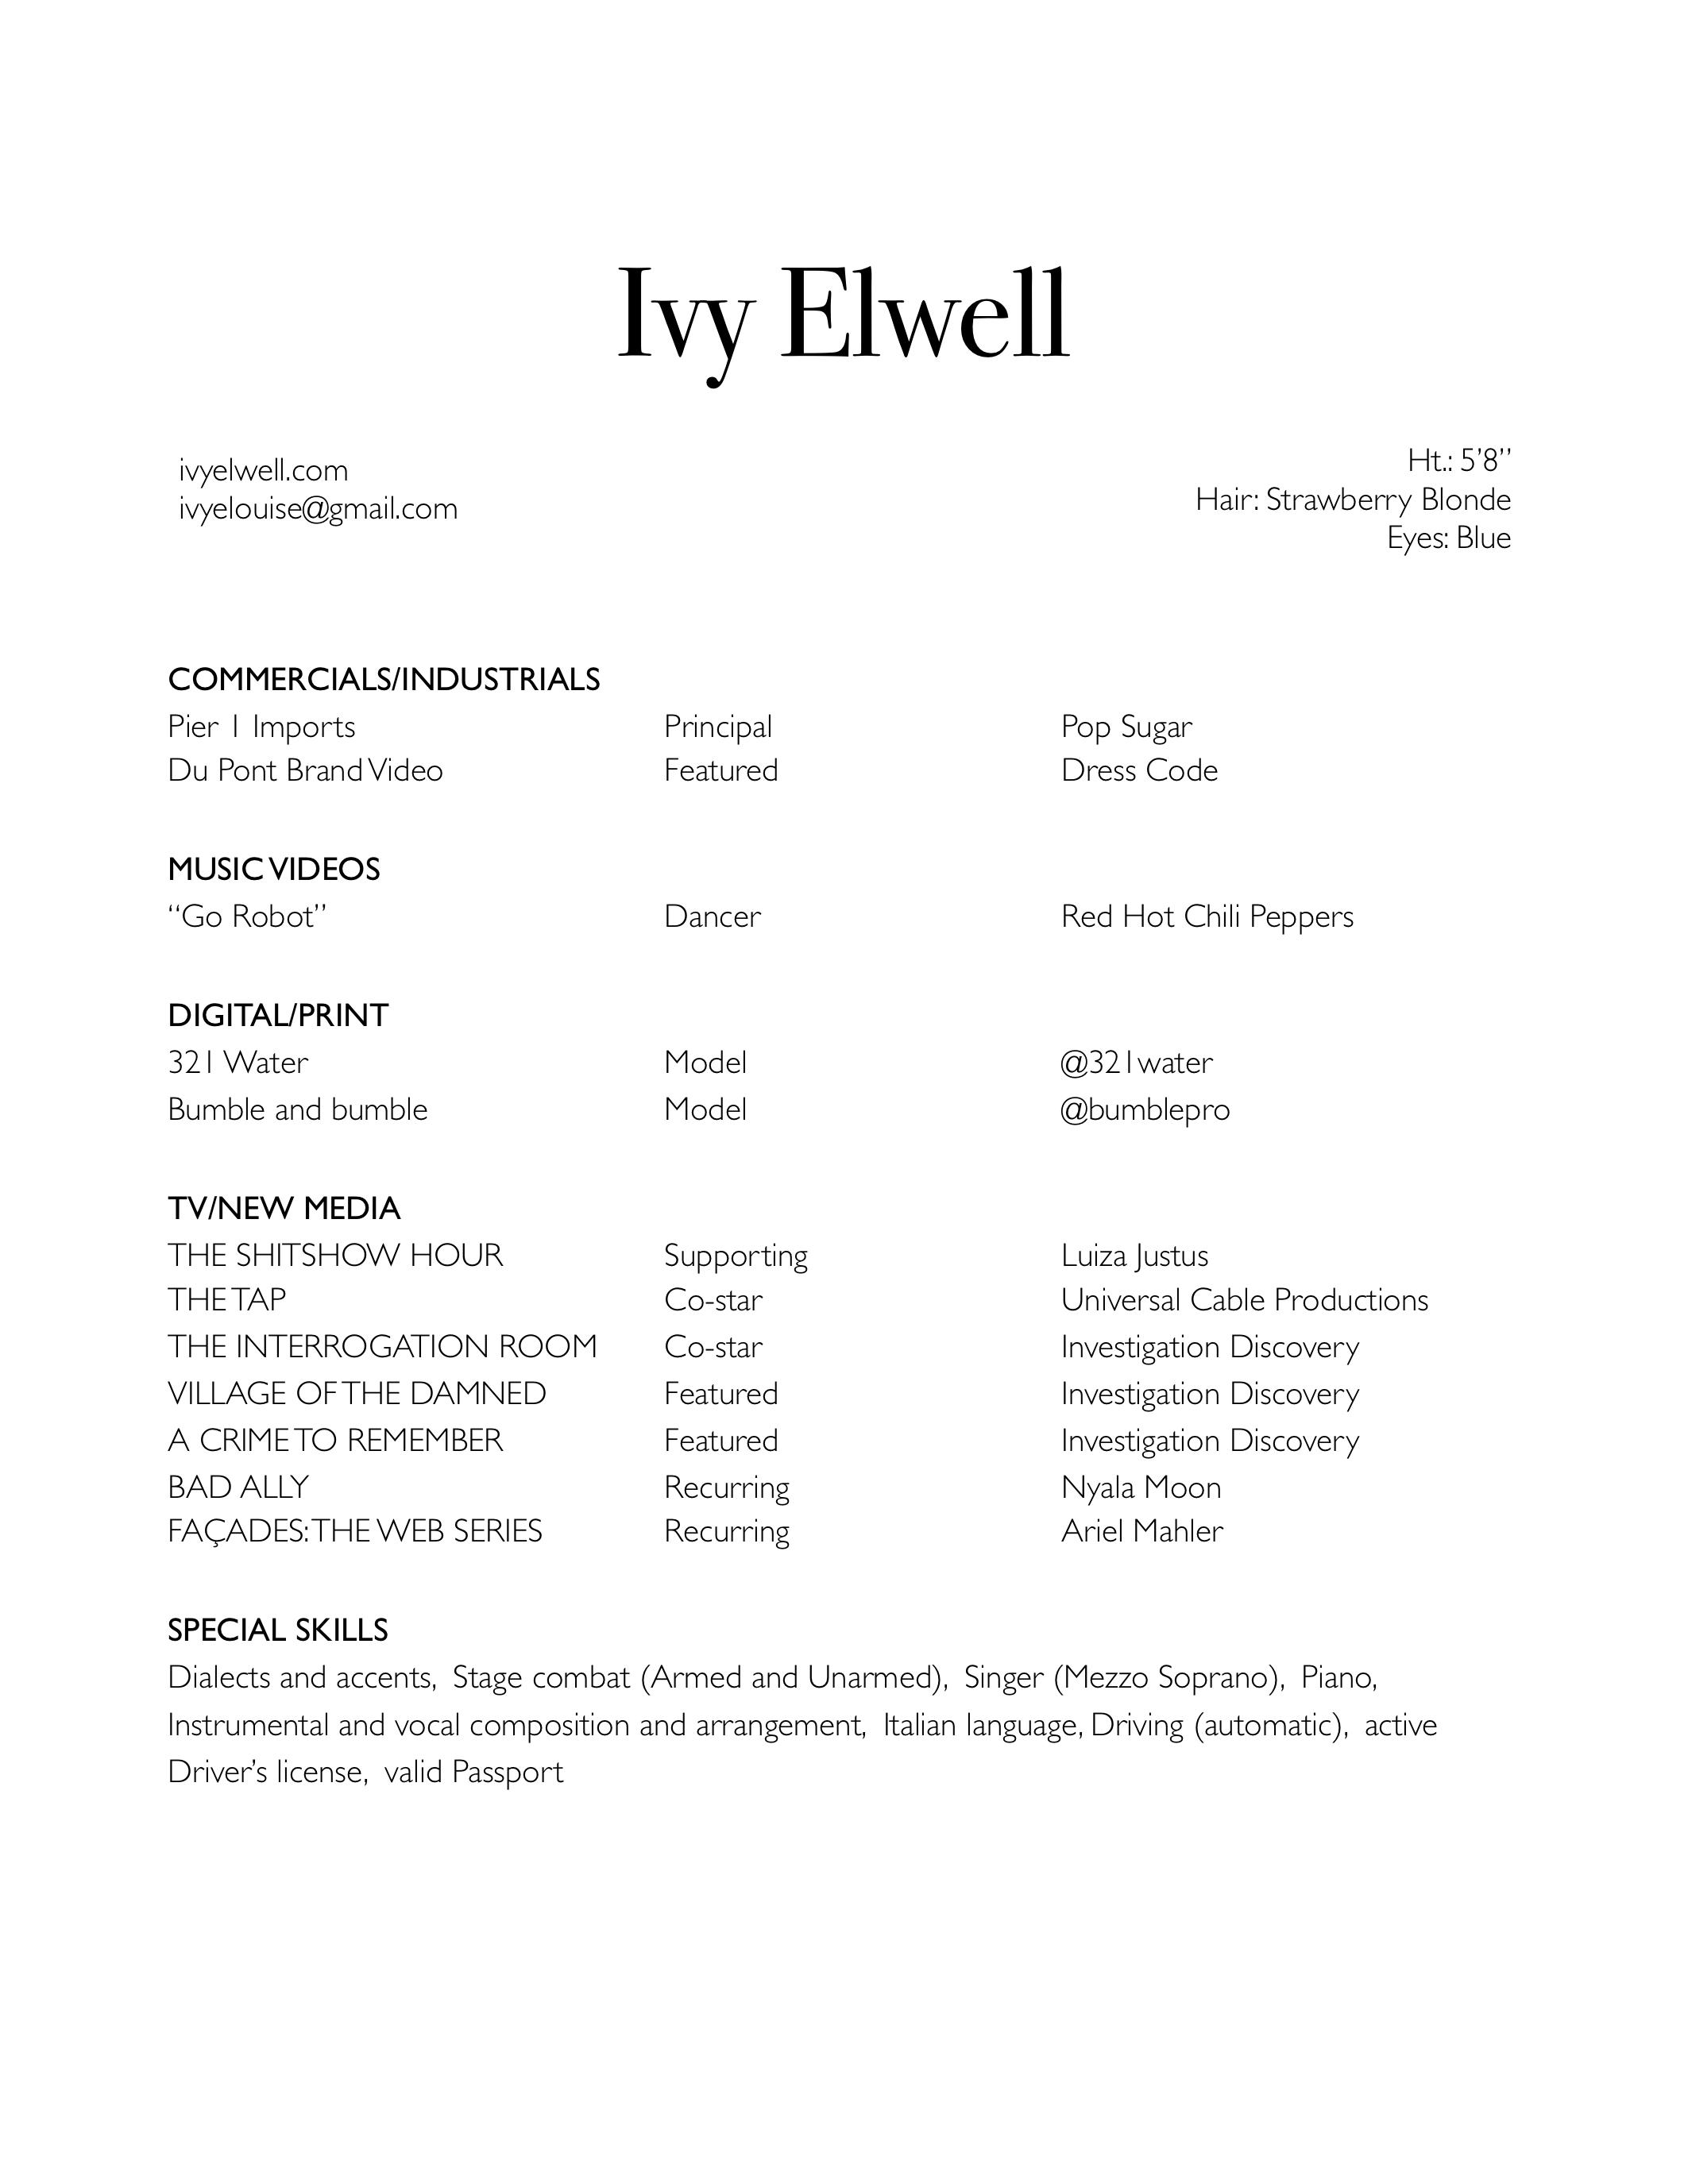 IvyElwell - Comm Resume - web - 5.4.19.png